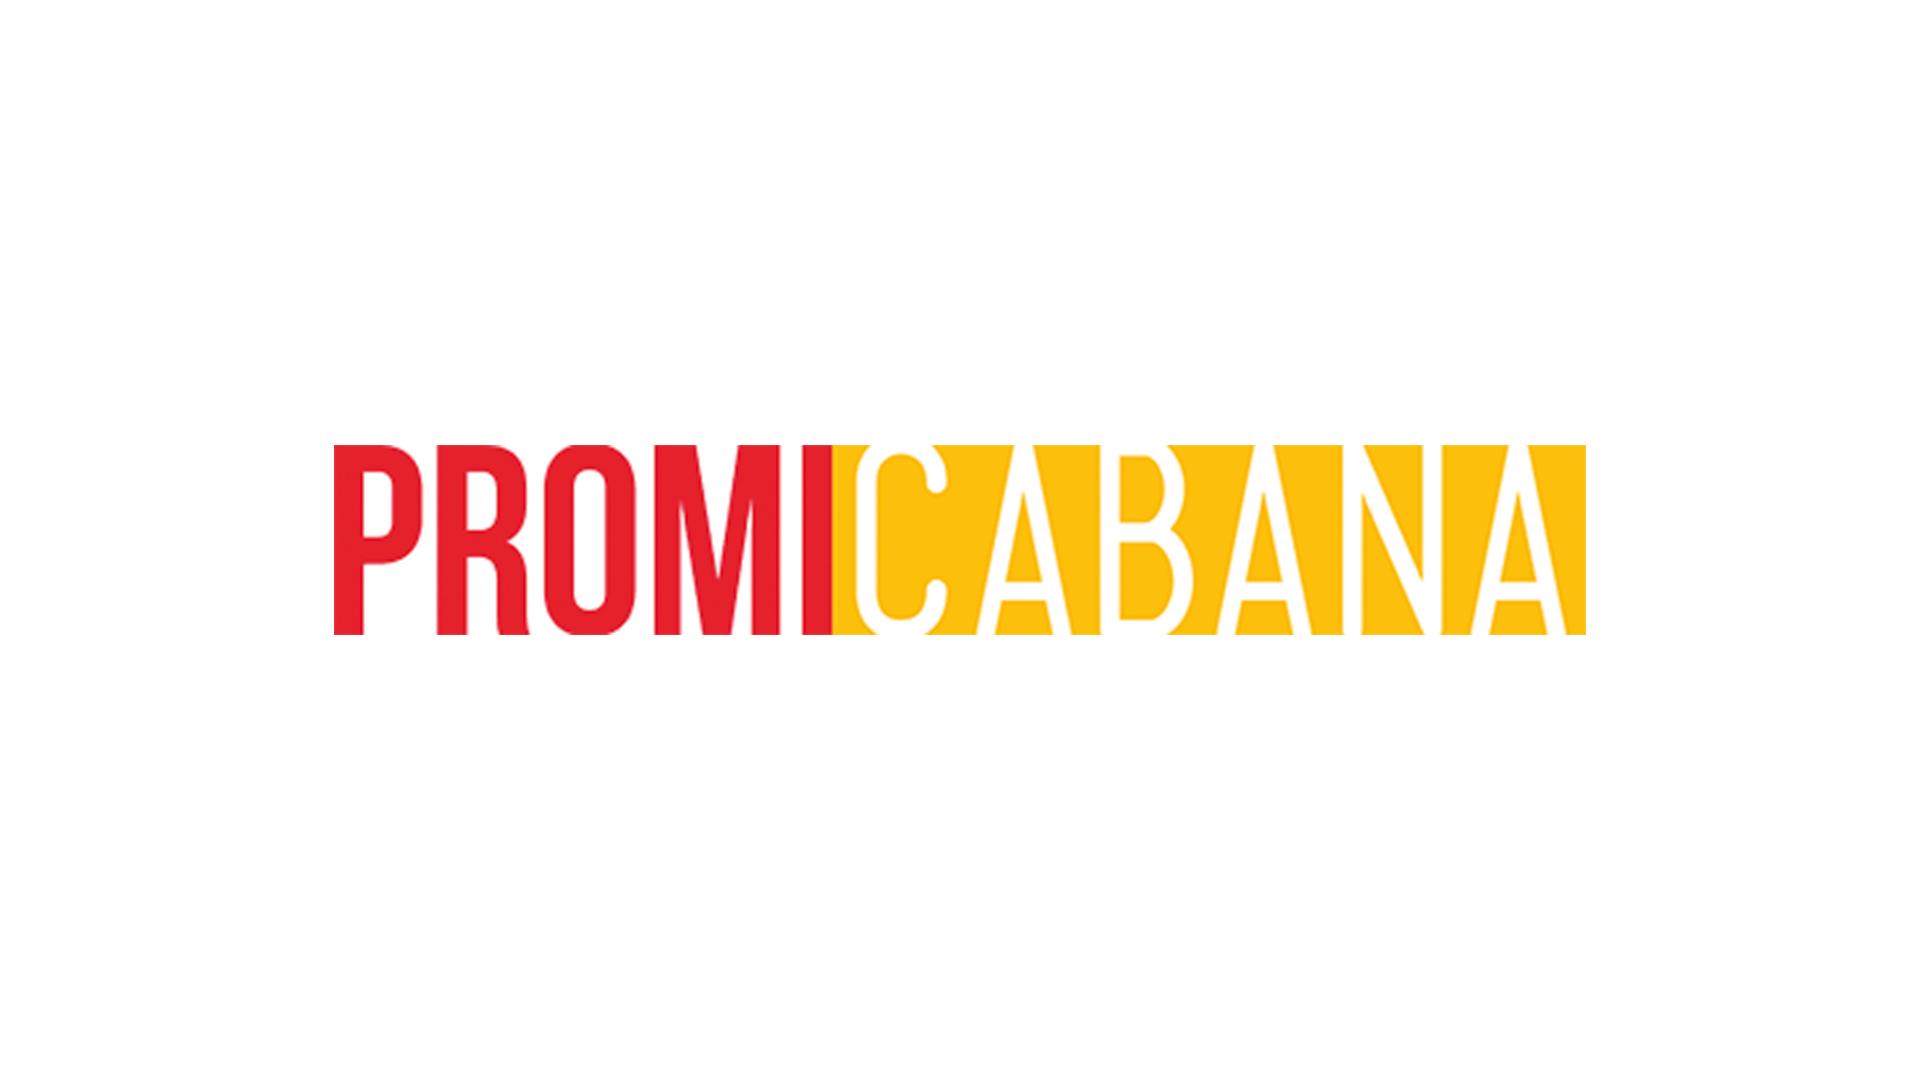 Robert-Pattinson-HFPA-Dinner-2014-Eddie-Redmayne-Morgan-Freeman